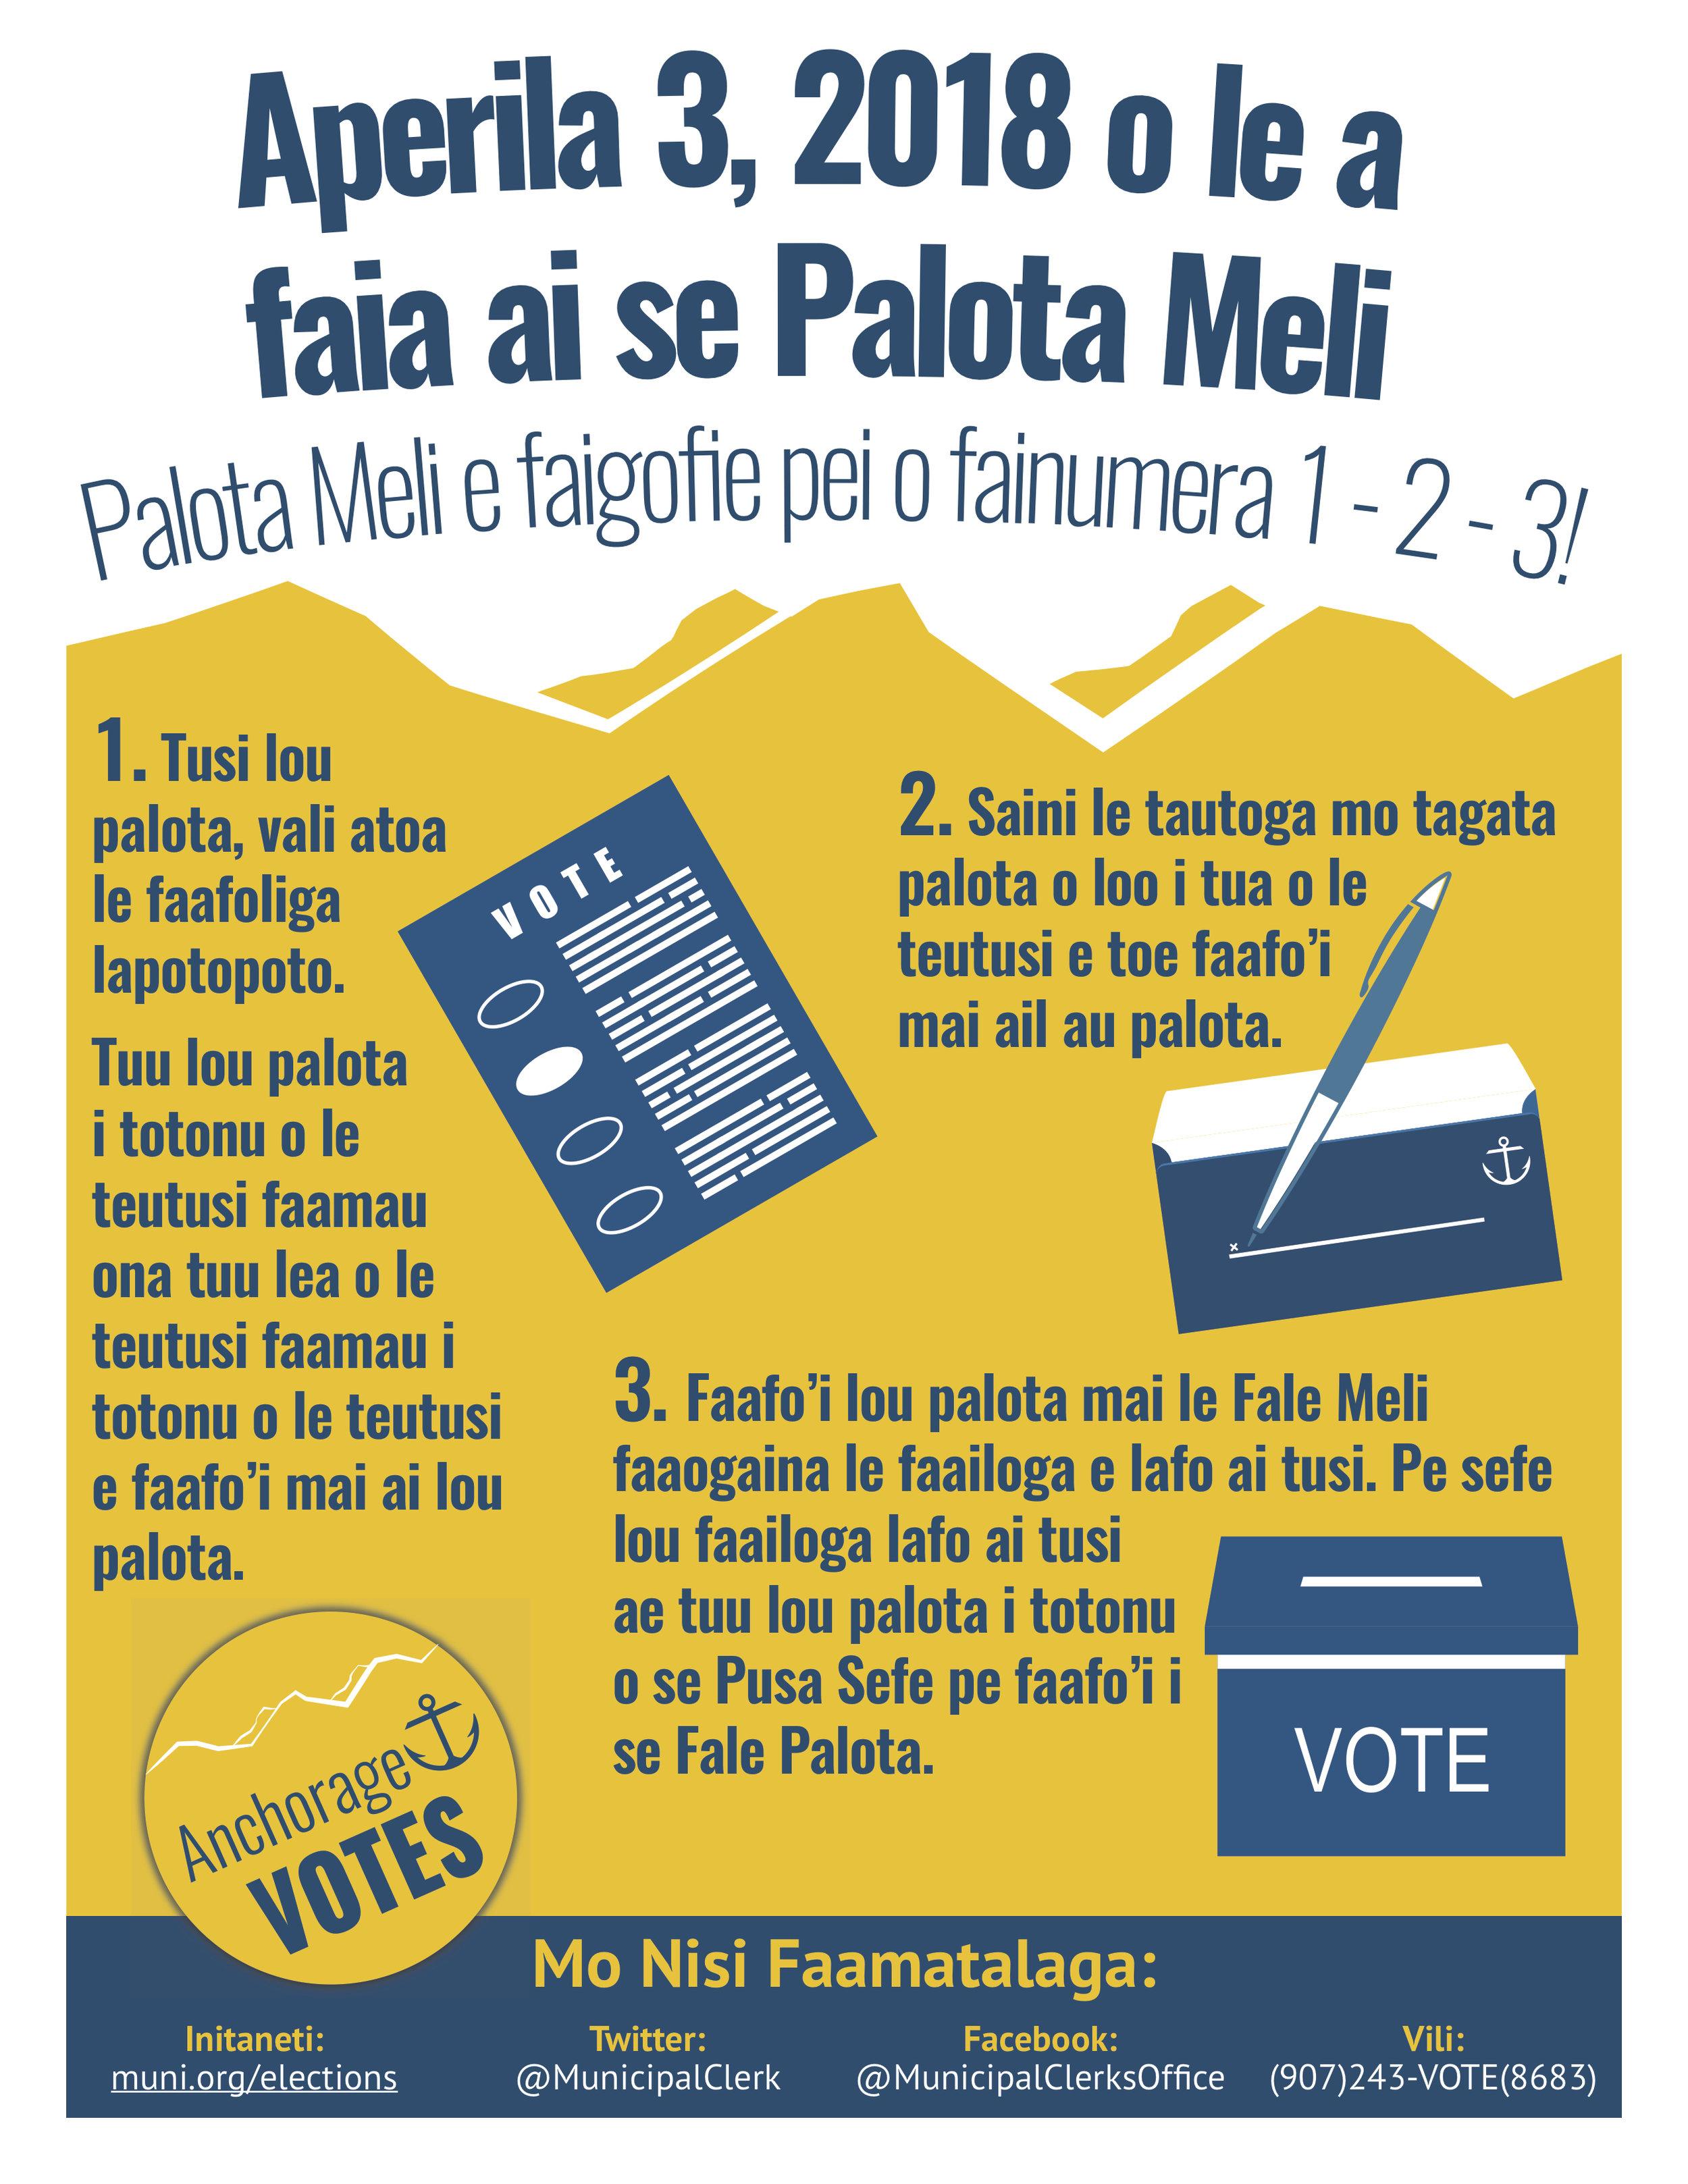 MAS 1026 Vote By Mail Info Poster 01_18_SOM.jpg